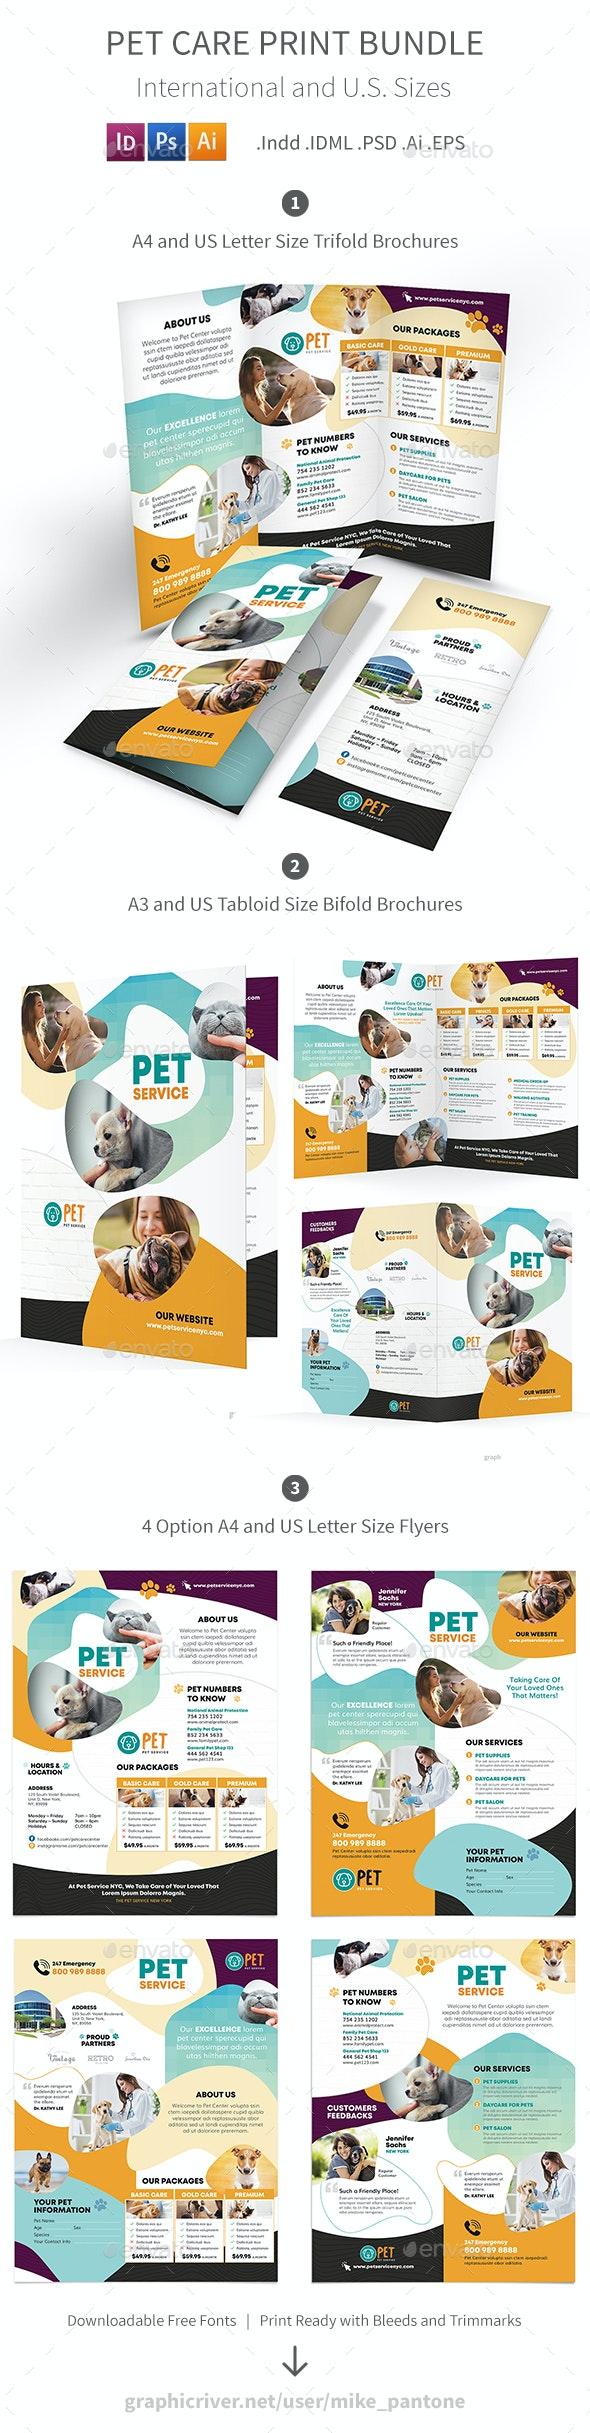 Pet Care Print Bundle 7 - Informational Brochures